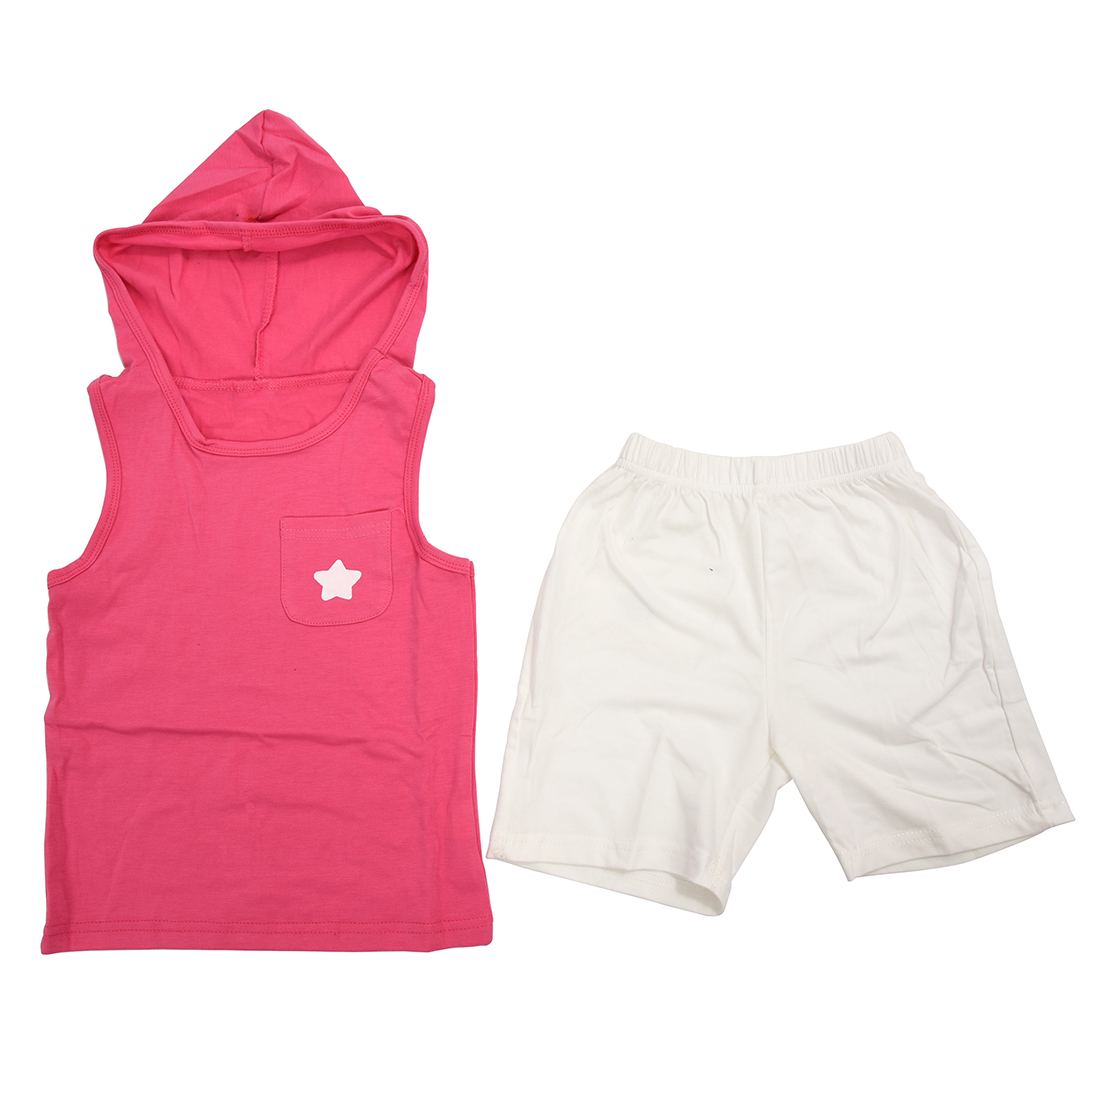 MACH boy girl children clothing cotton summer cloth baby kids clothing suit set vest + short hooded sports sets star pink 110cm